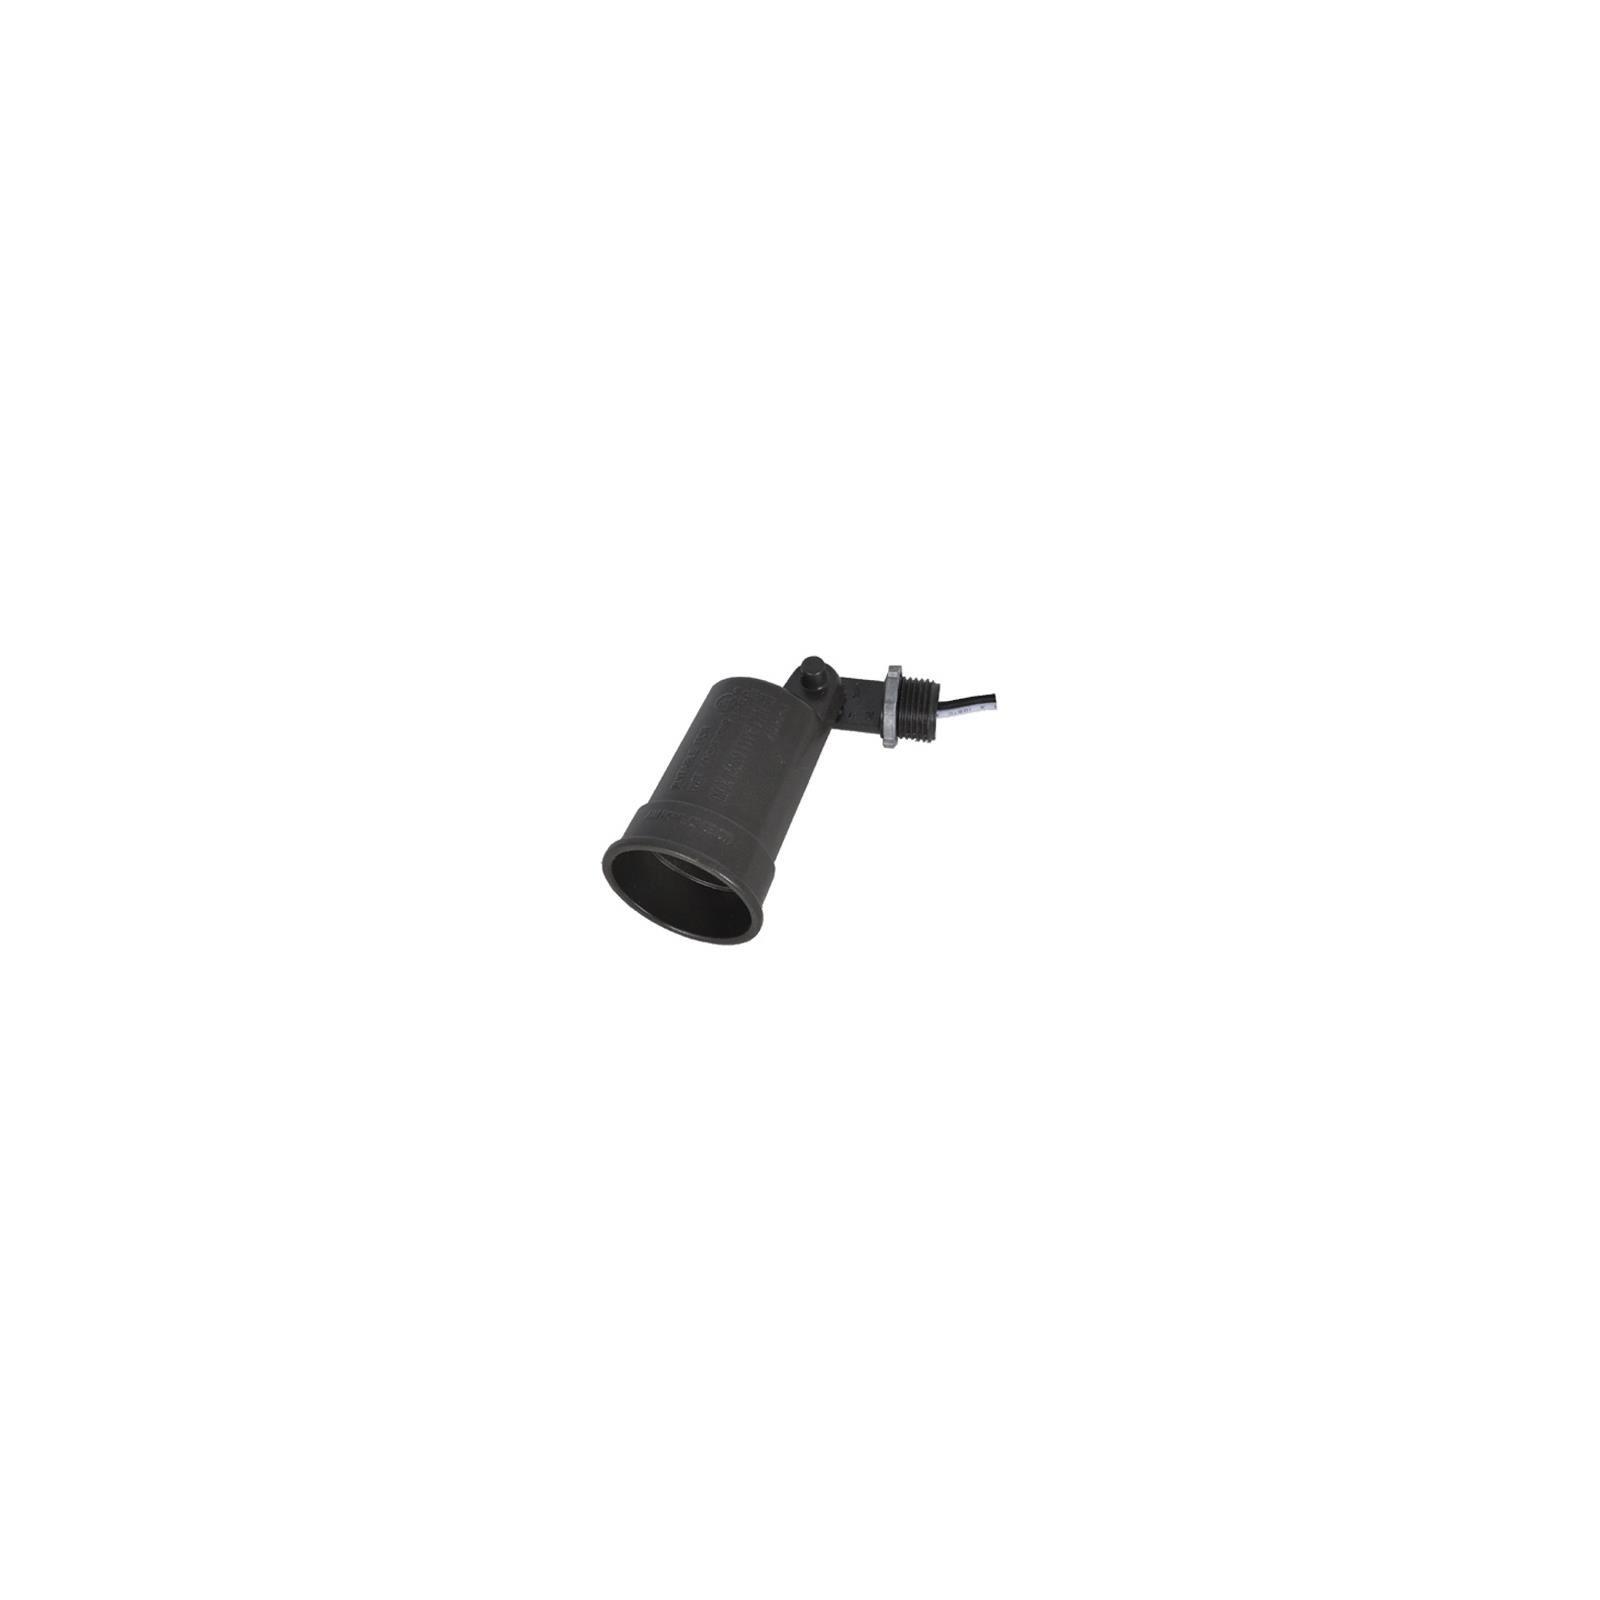 Hubbell Electrical Products LH150-2-BR Bronze Weatherproof Porcelain Socket Lampholder - Quantity 25